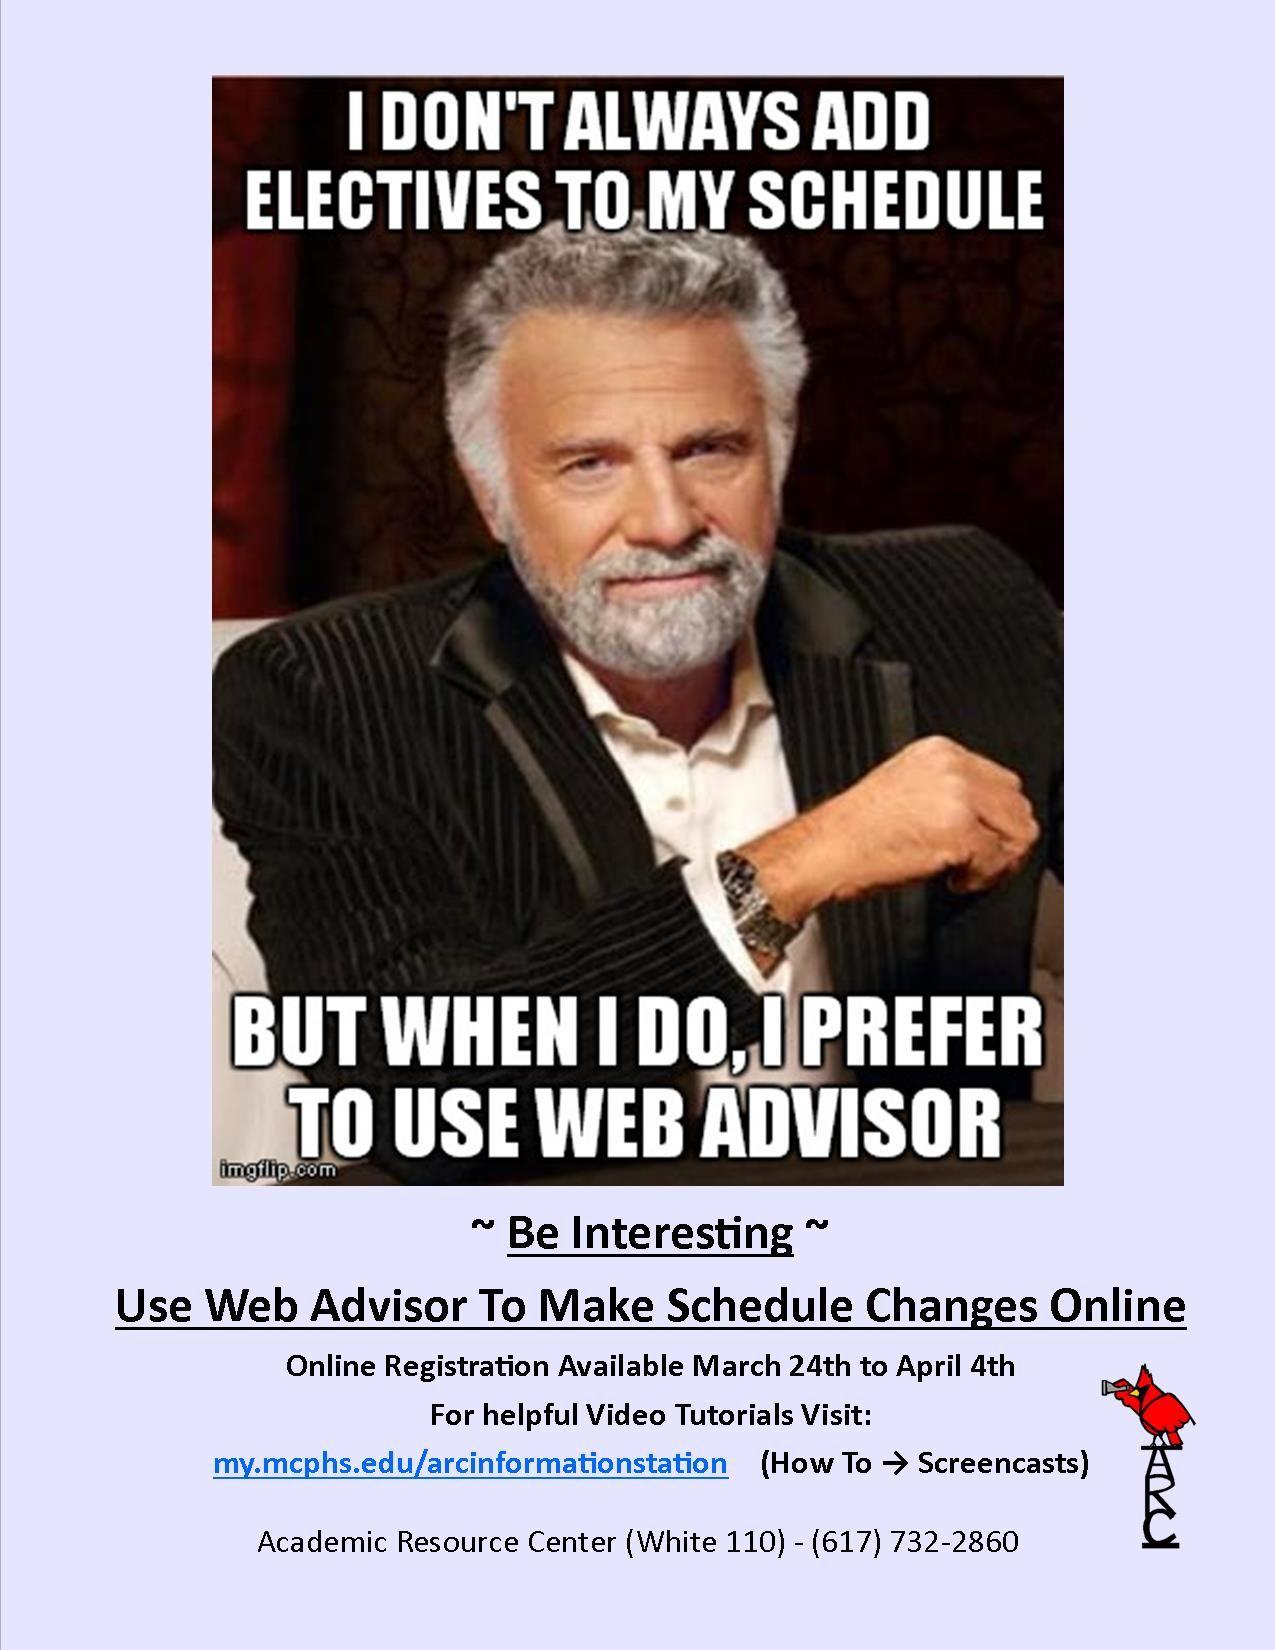 507d496077e173ff9c616f06de22fe71 academic advising meme google search funny funny pinterest